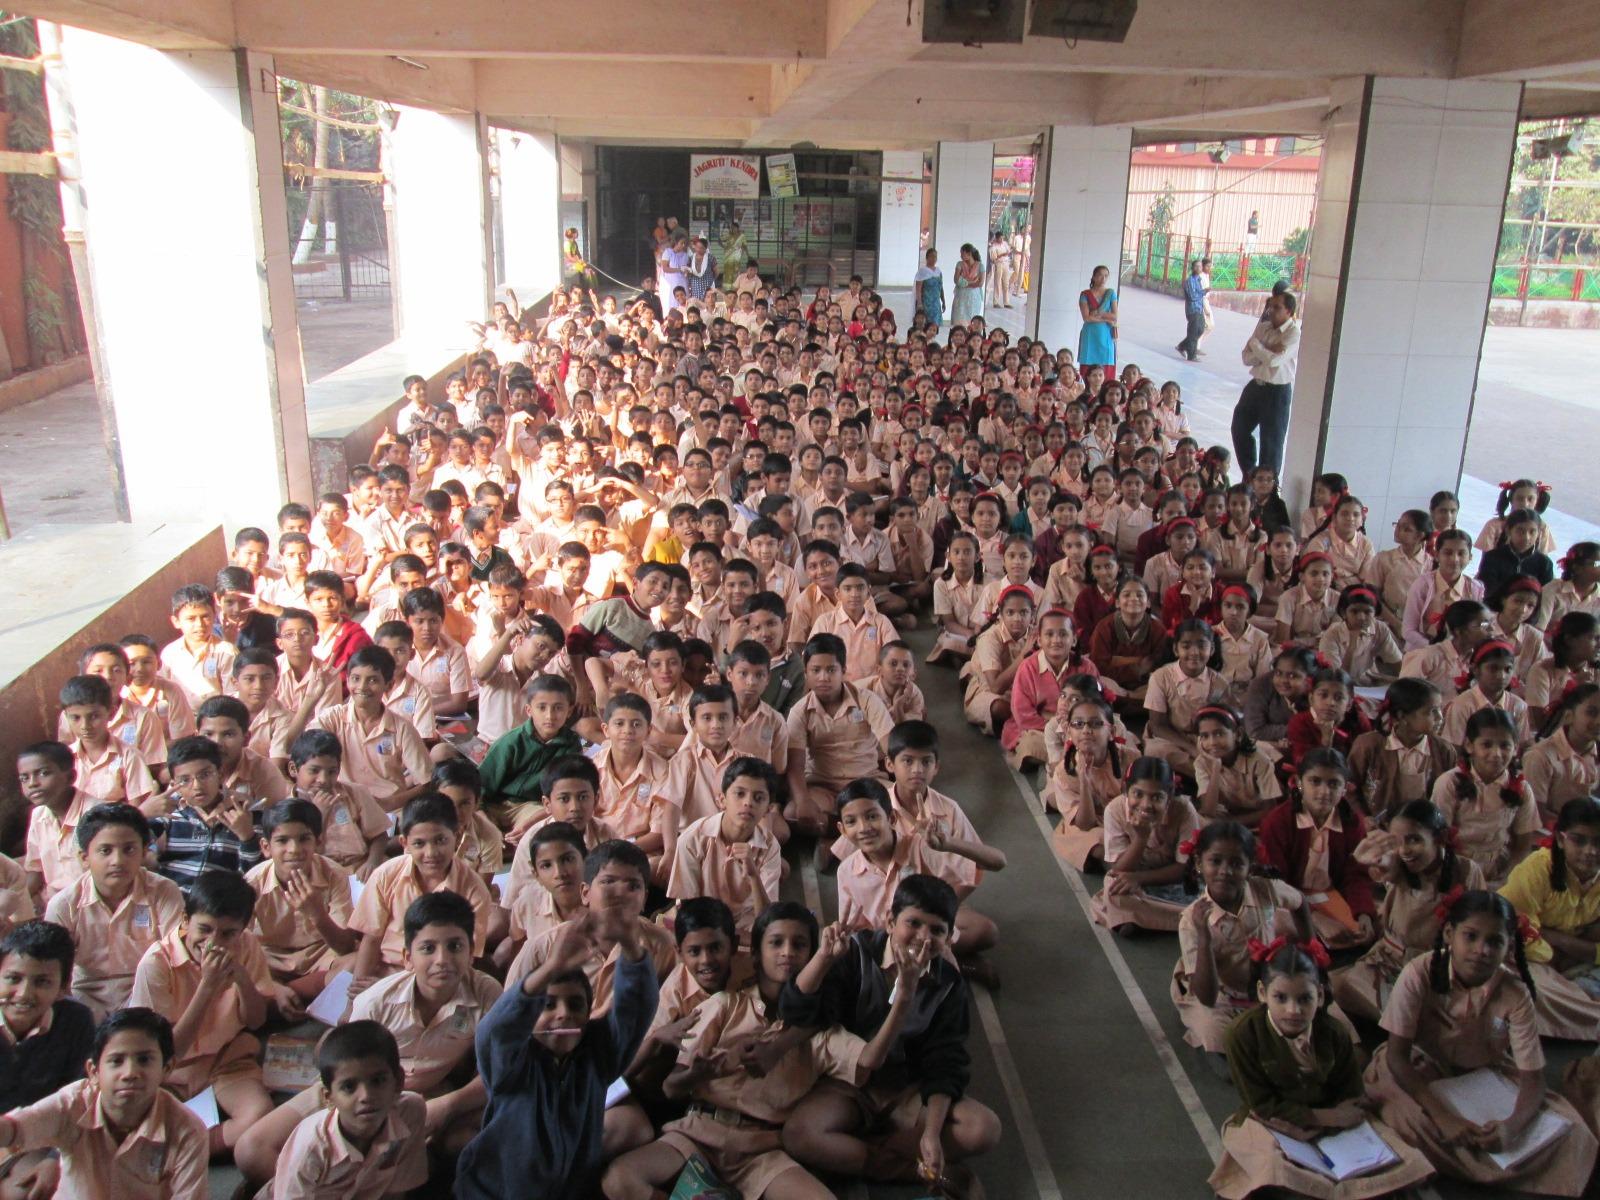 St. Jude's School, INDIA